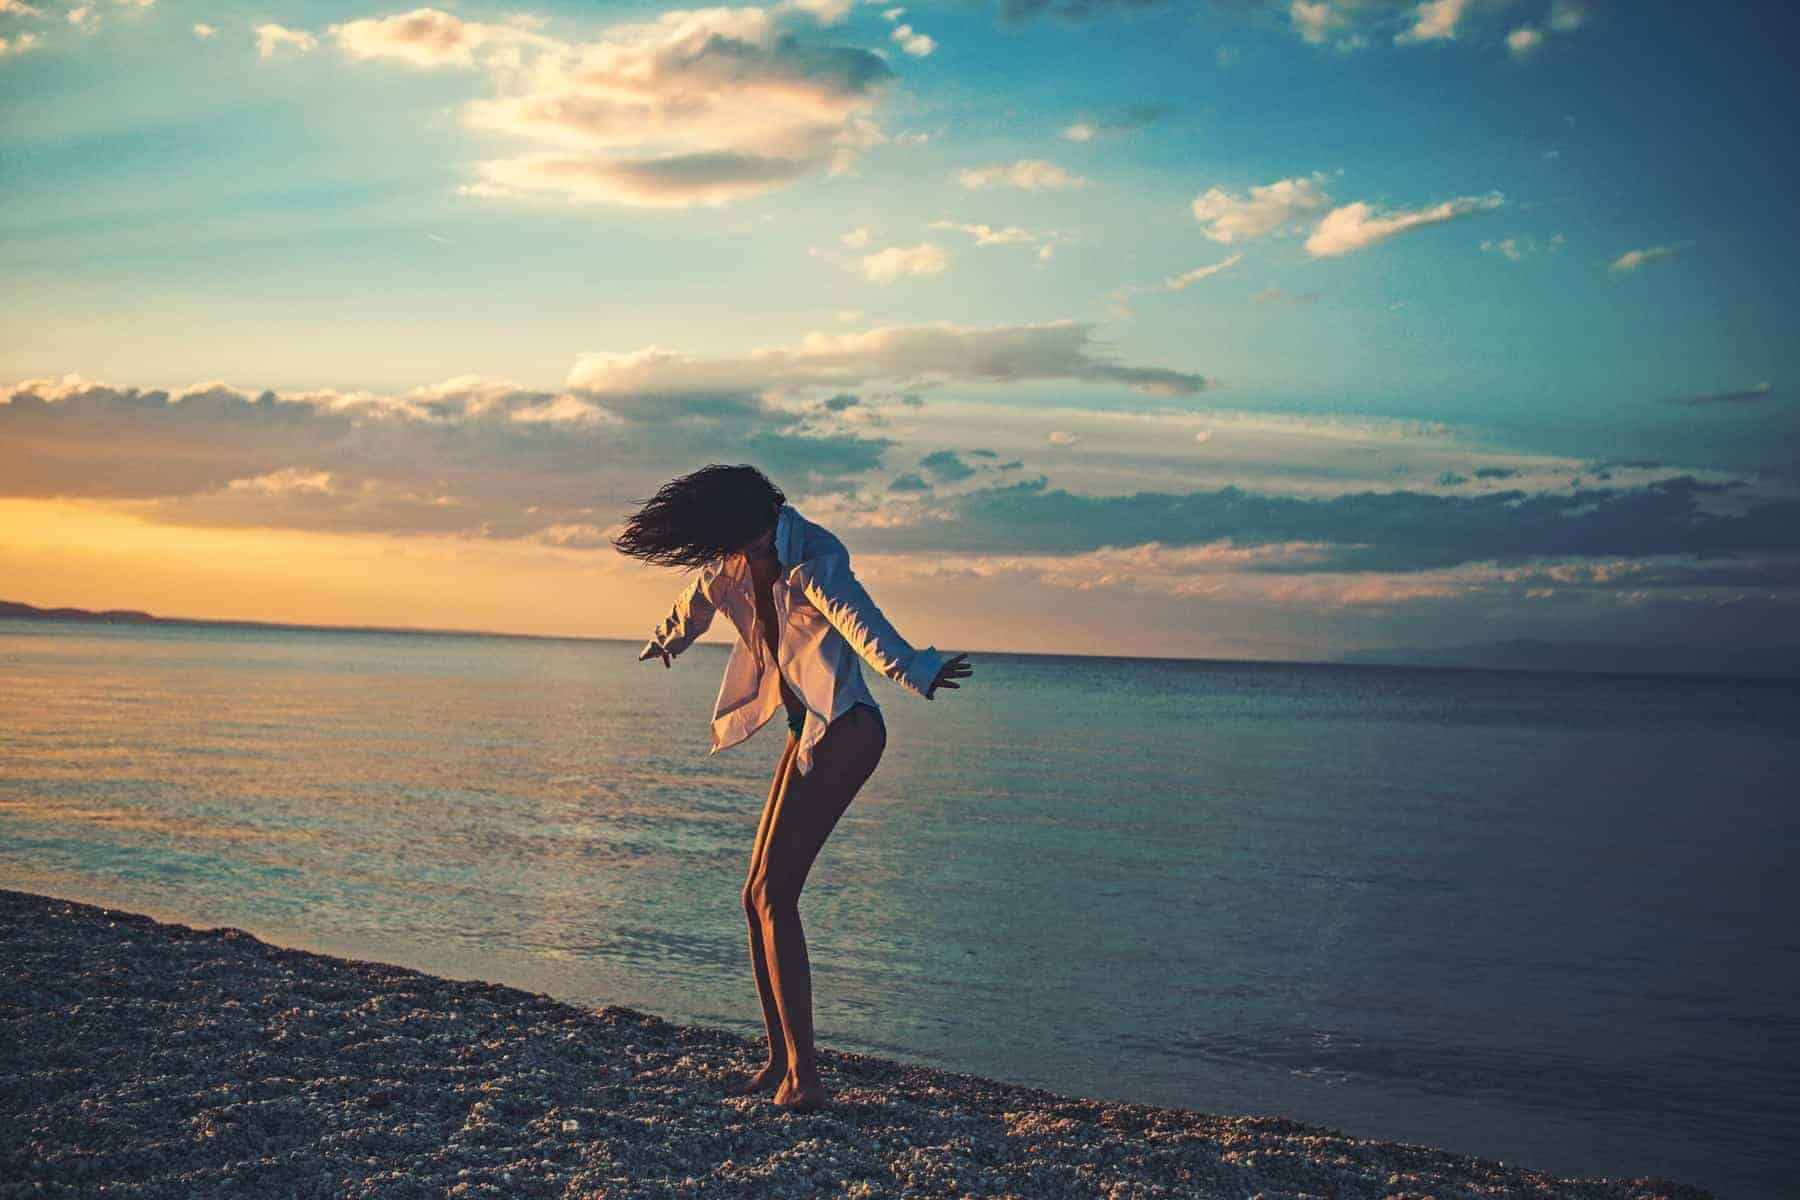 Bahama girl dancing in the sunset